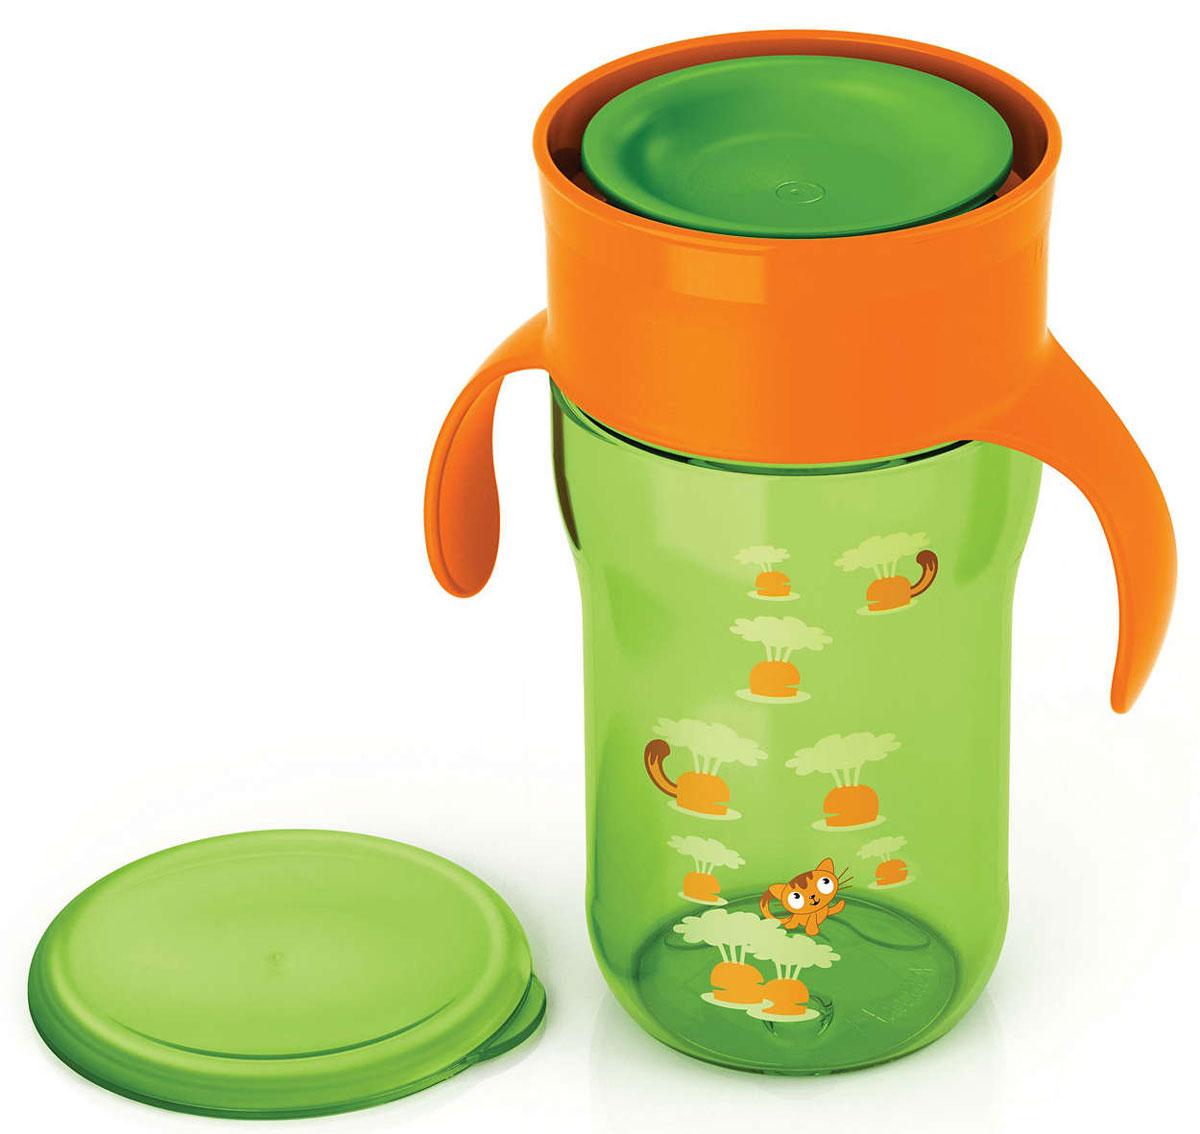 Philips Avent Взрослая чашка, 340 мл, 18м+, 1 шт зеленый оранжевый SCF784/00 philips avent чашка поильник 260 мл 12м красный scf782 00